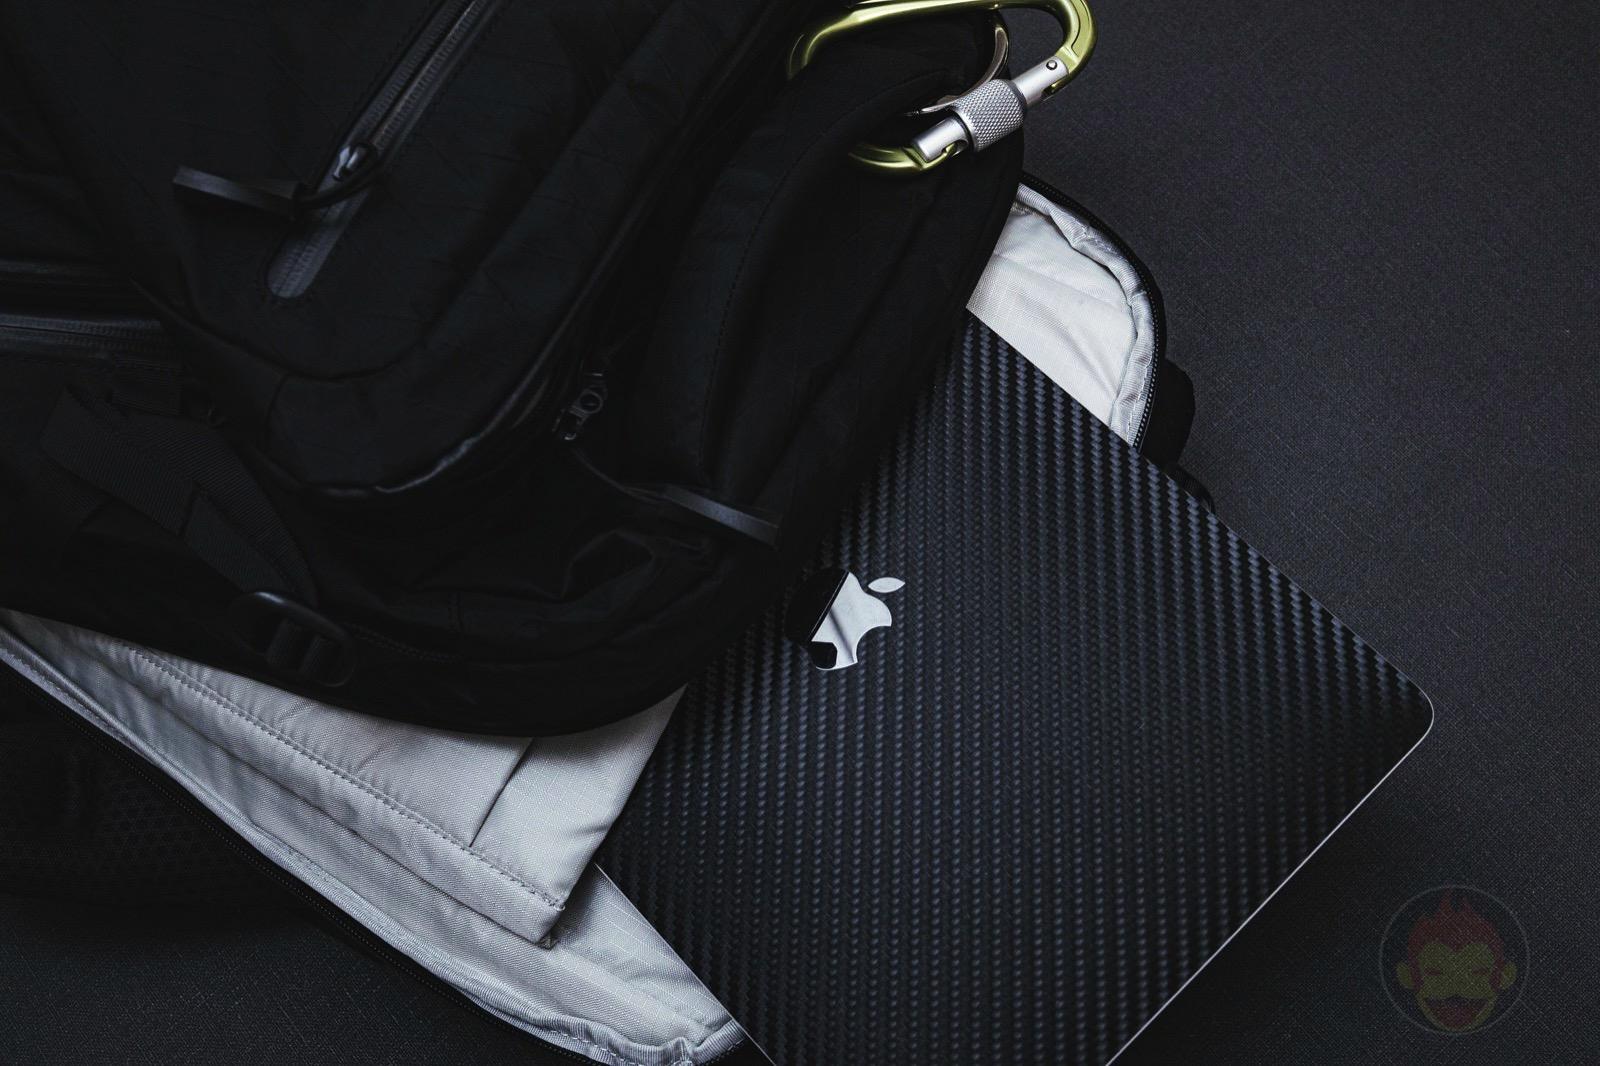 MacBook-Pro-13inch-or-15inch-2019-comparison-07.jpg